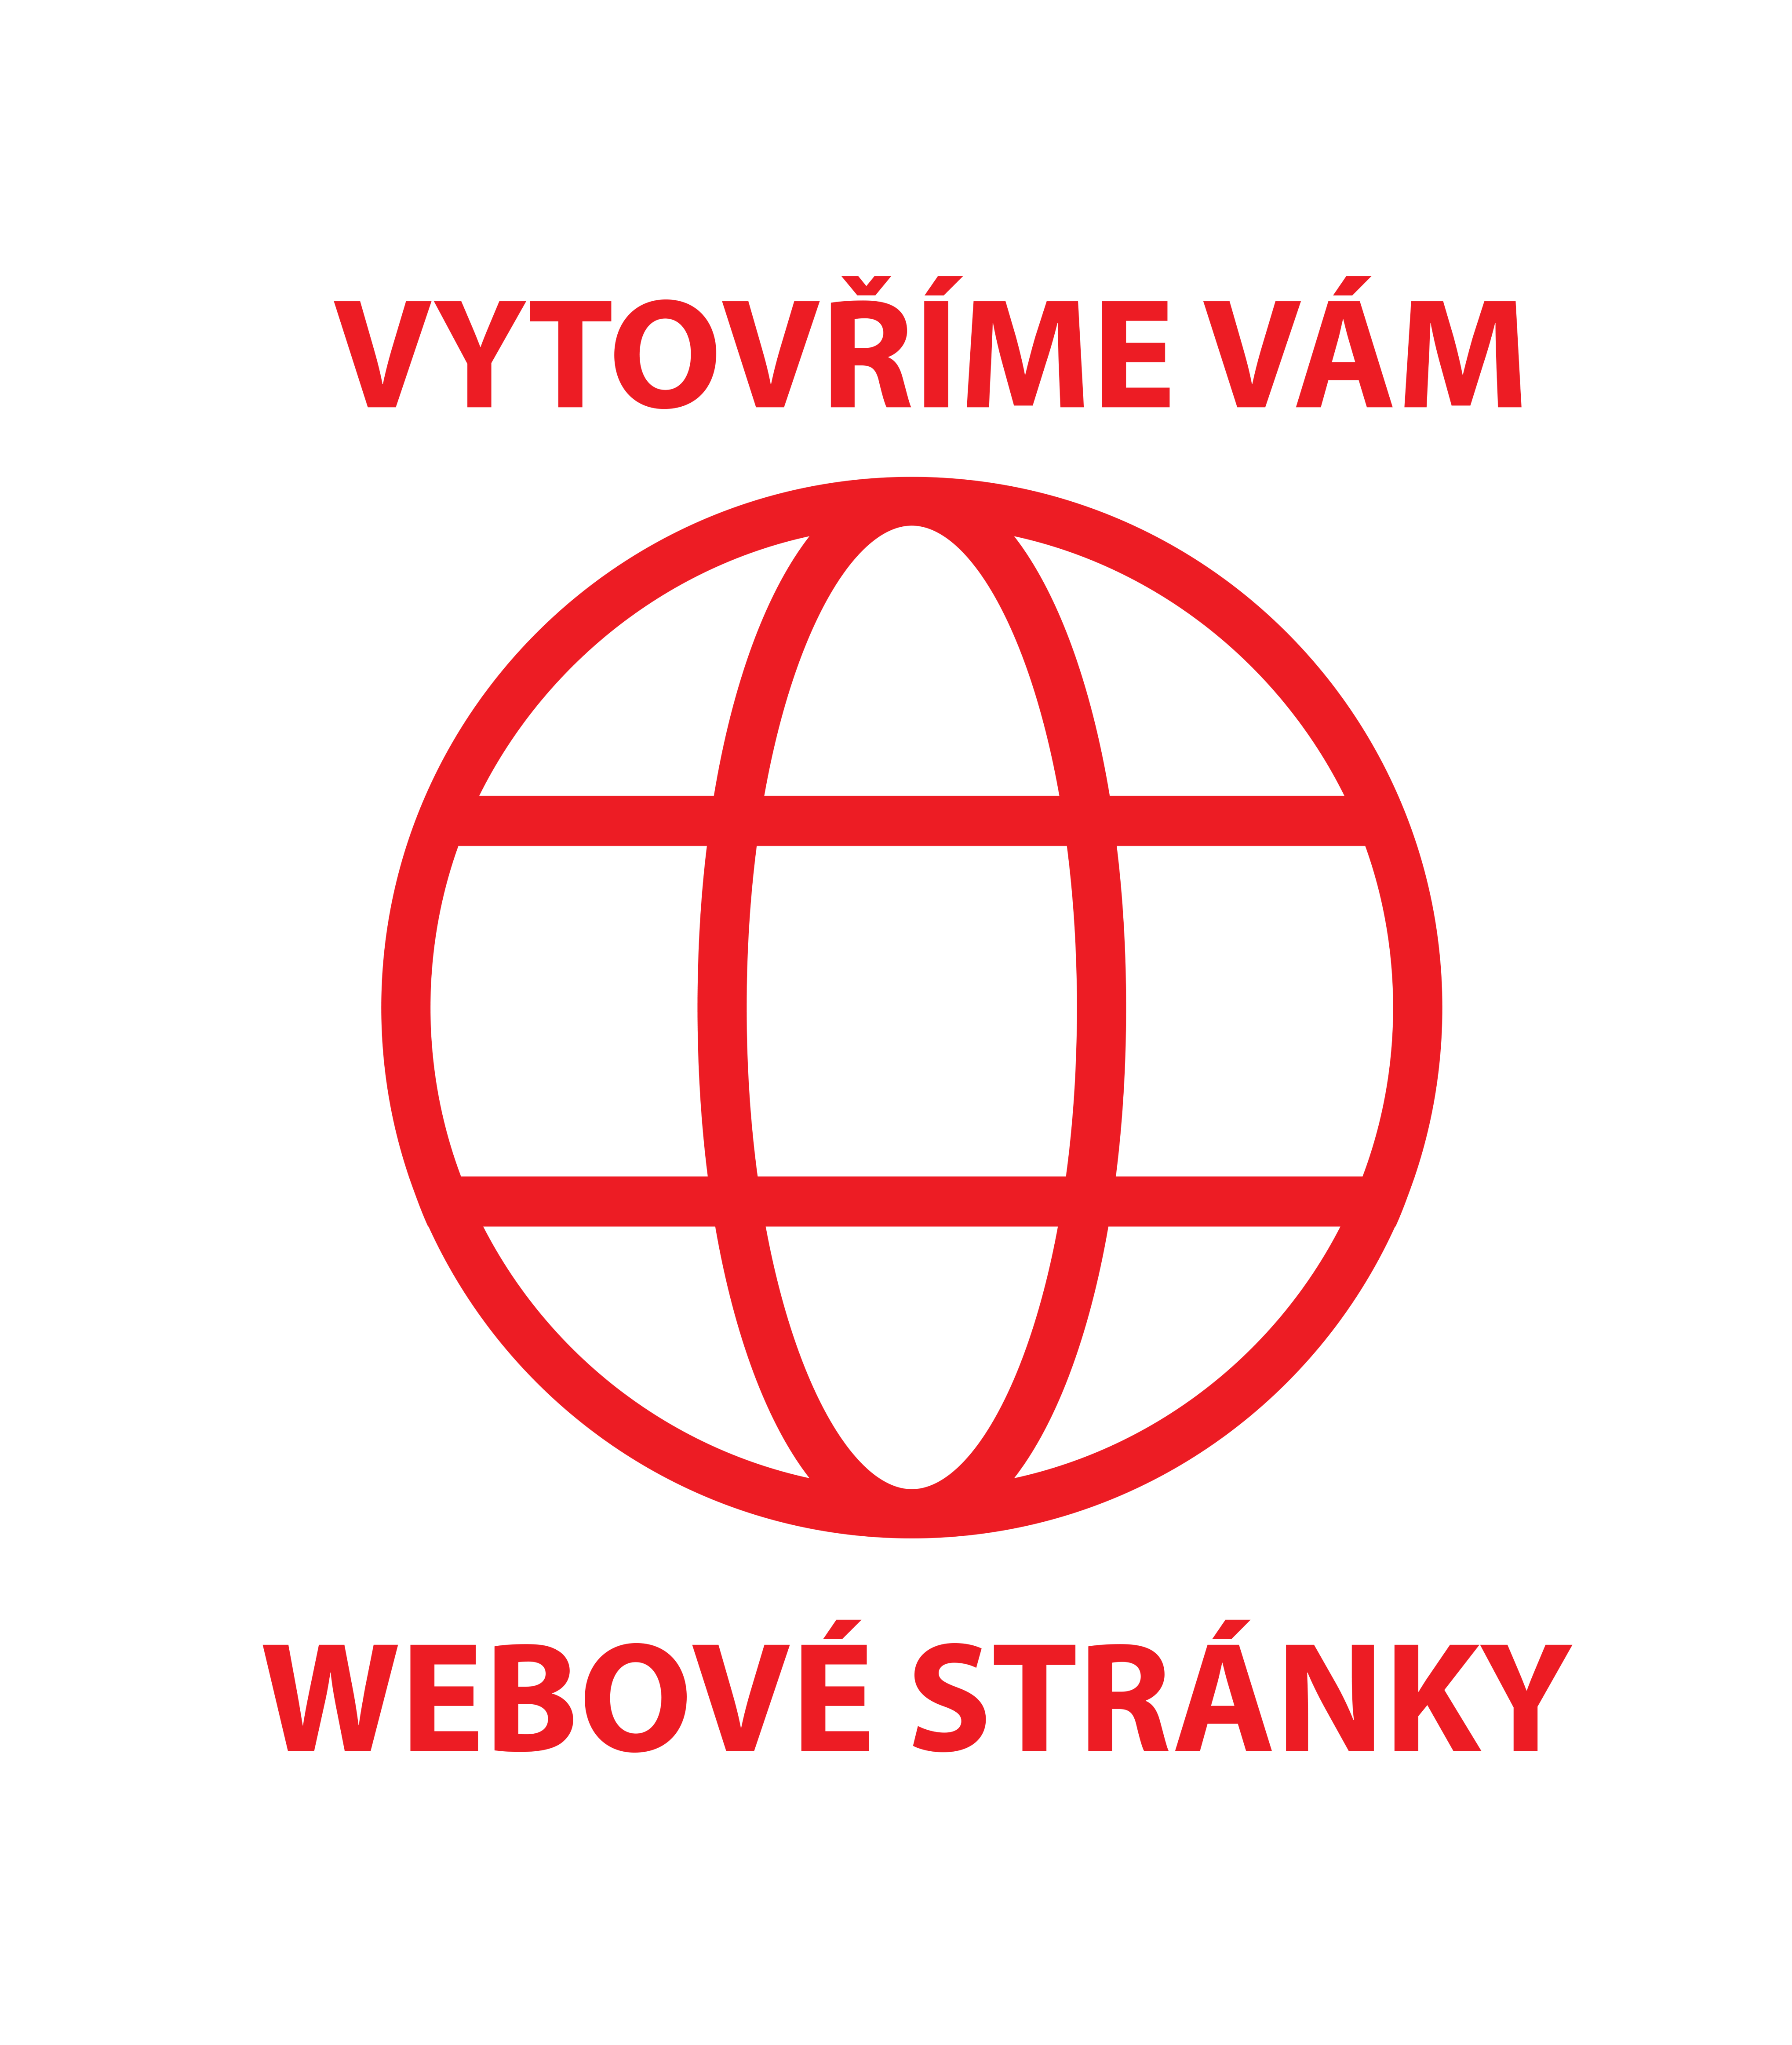 Webovky